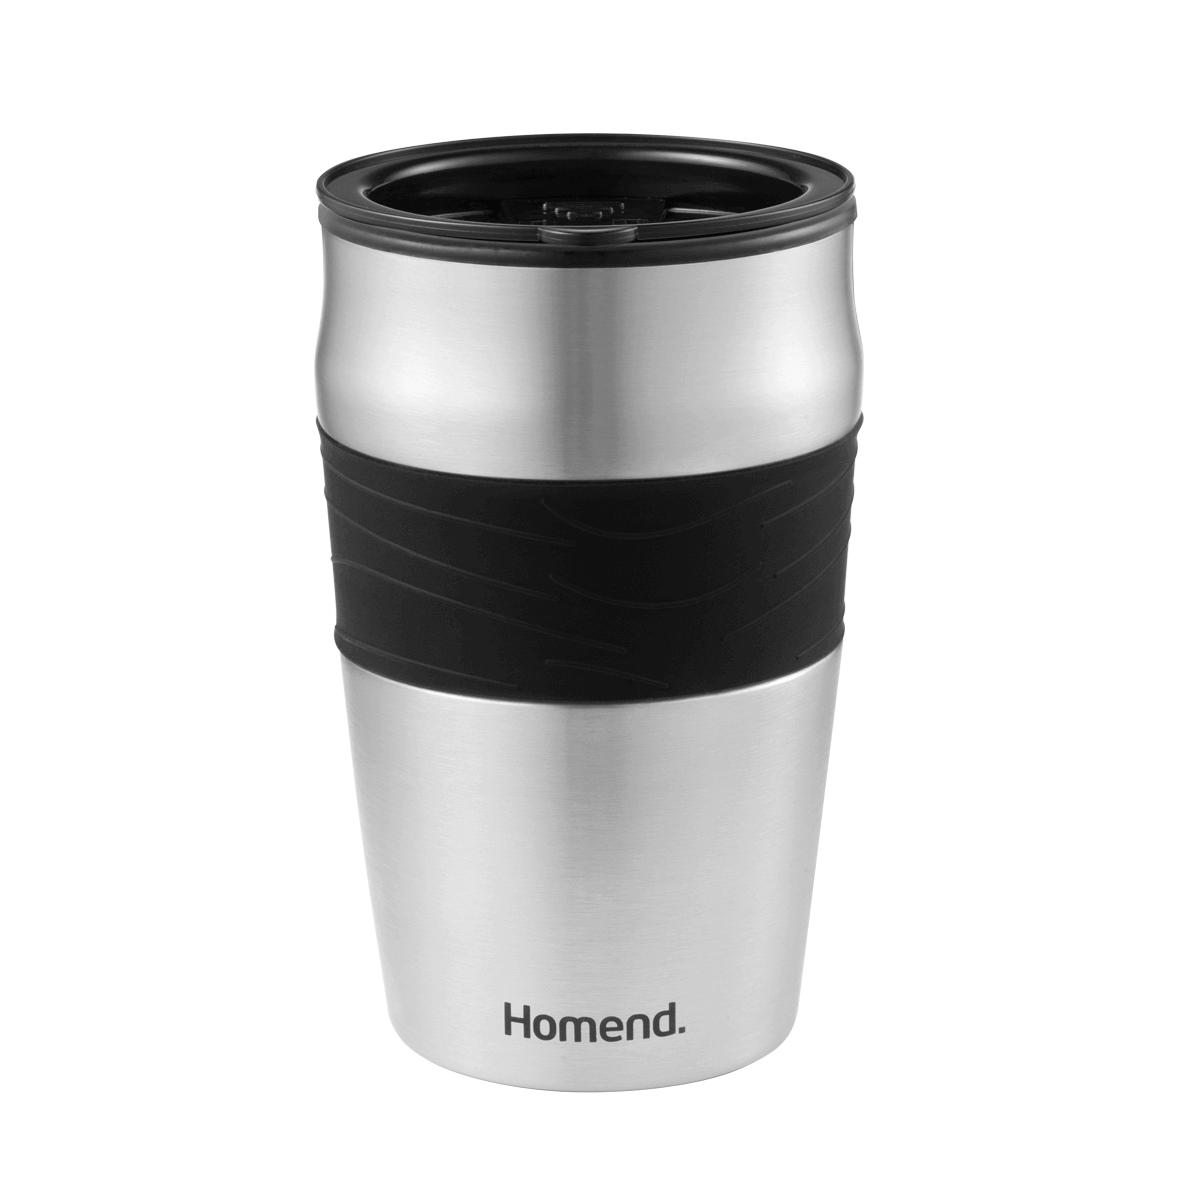 Fantastik güve Ehlileştirmek homend 5004 coffeebreak - emreapy.com